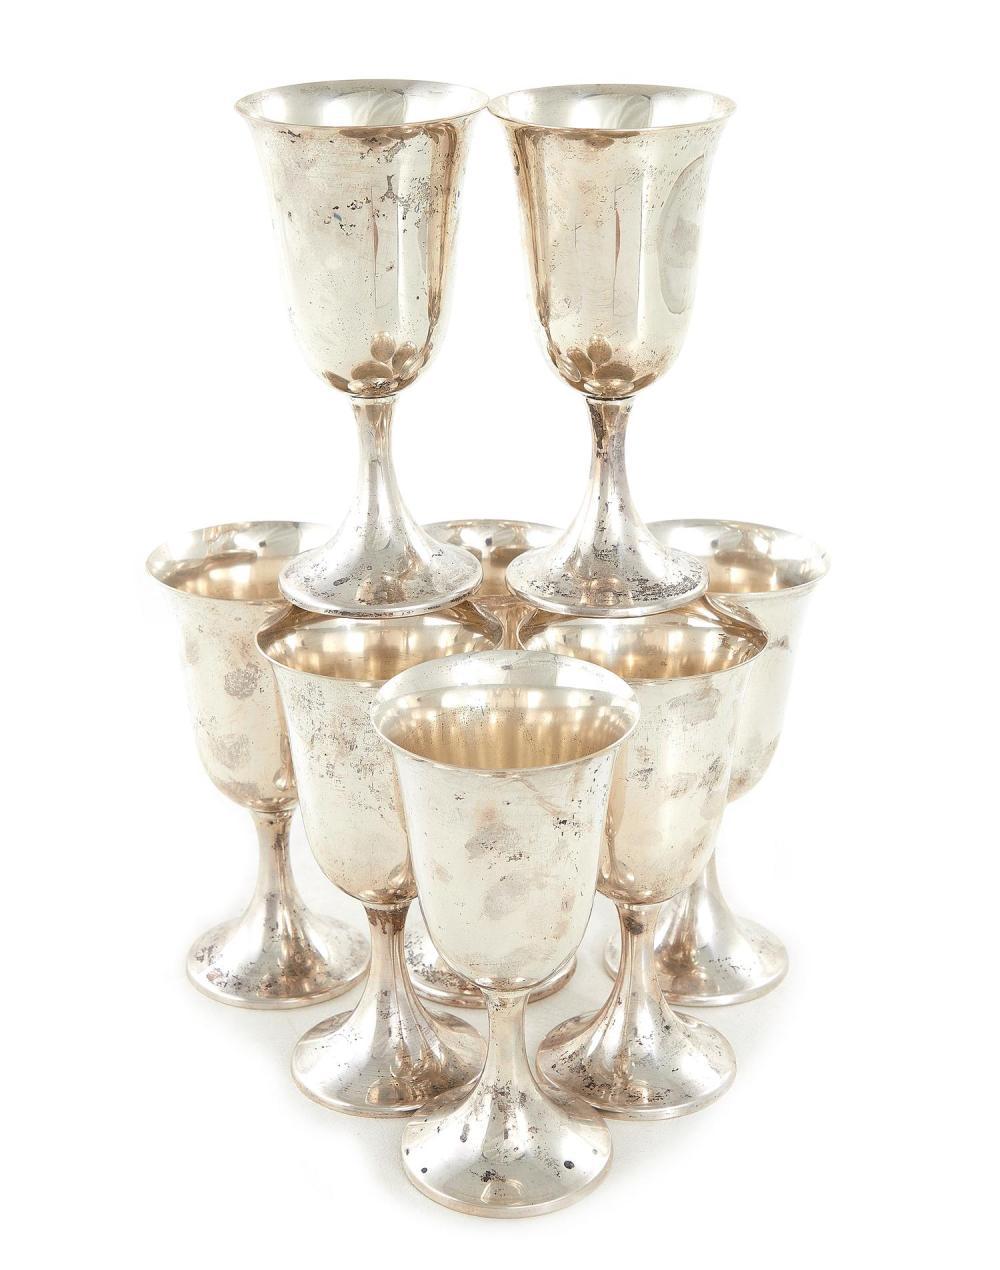 American silver goblets, Preisner (8pcs)